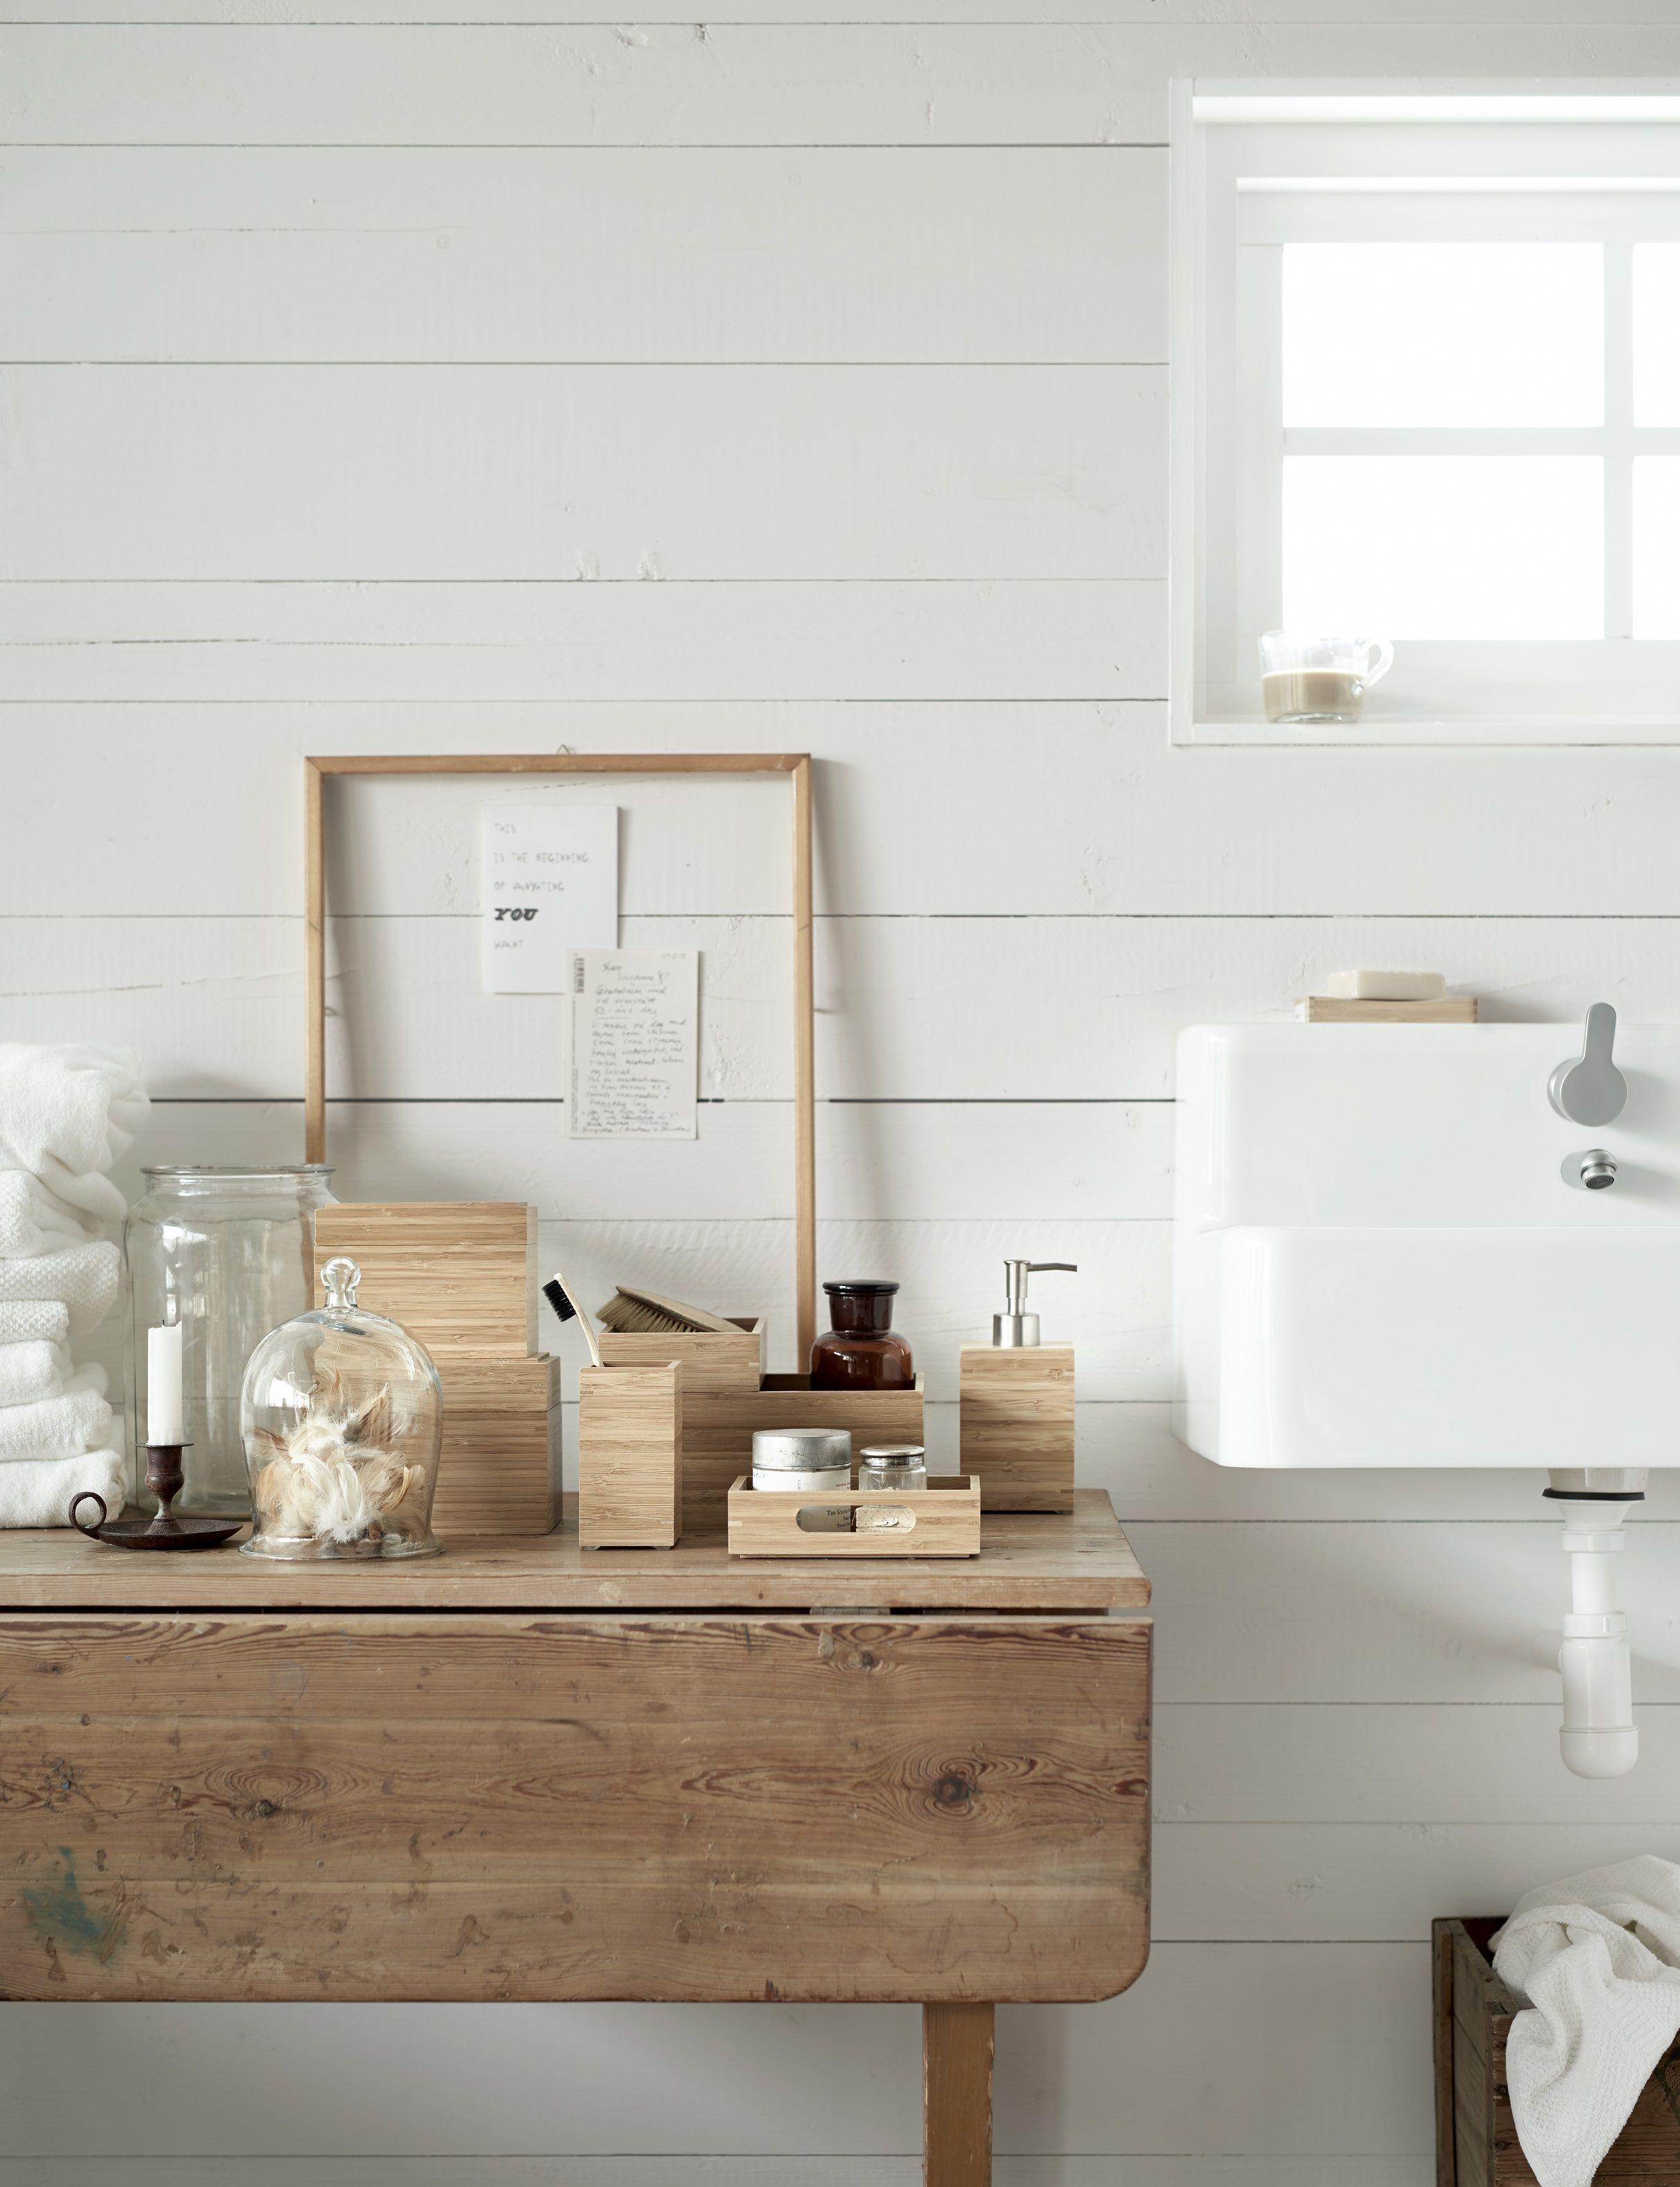 dragan collectie | #ikea #ikeanl #badkamer #accessoires #bamboe, Badkamer